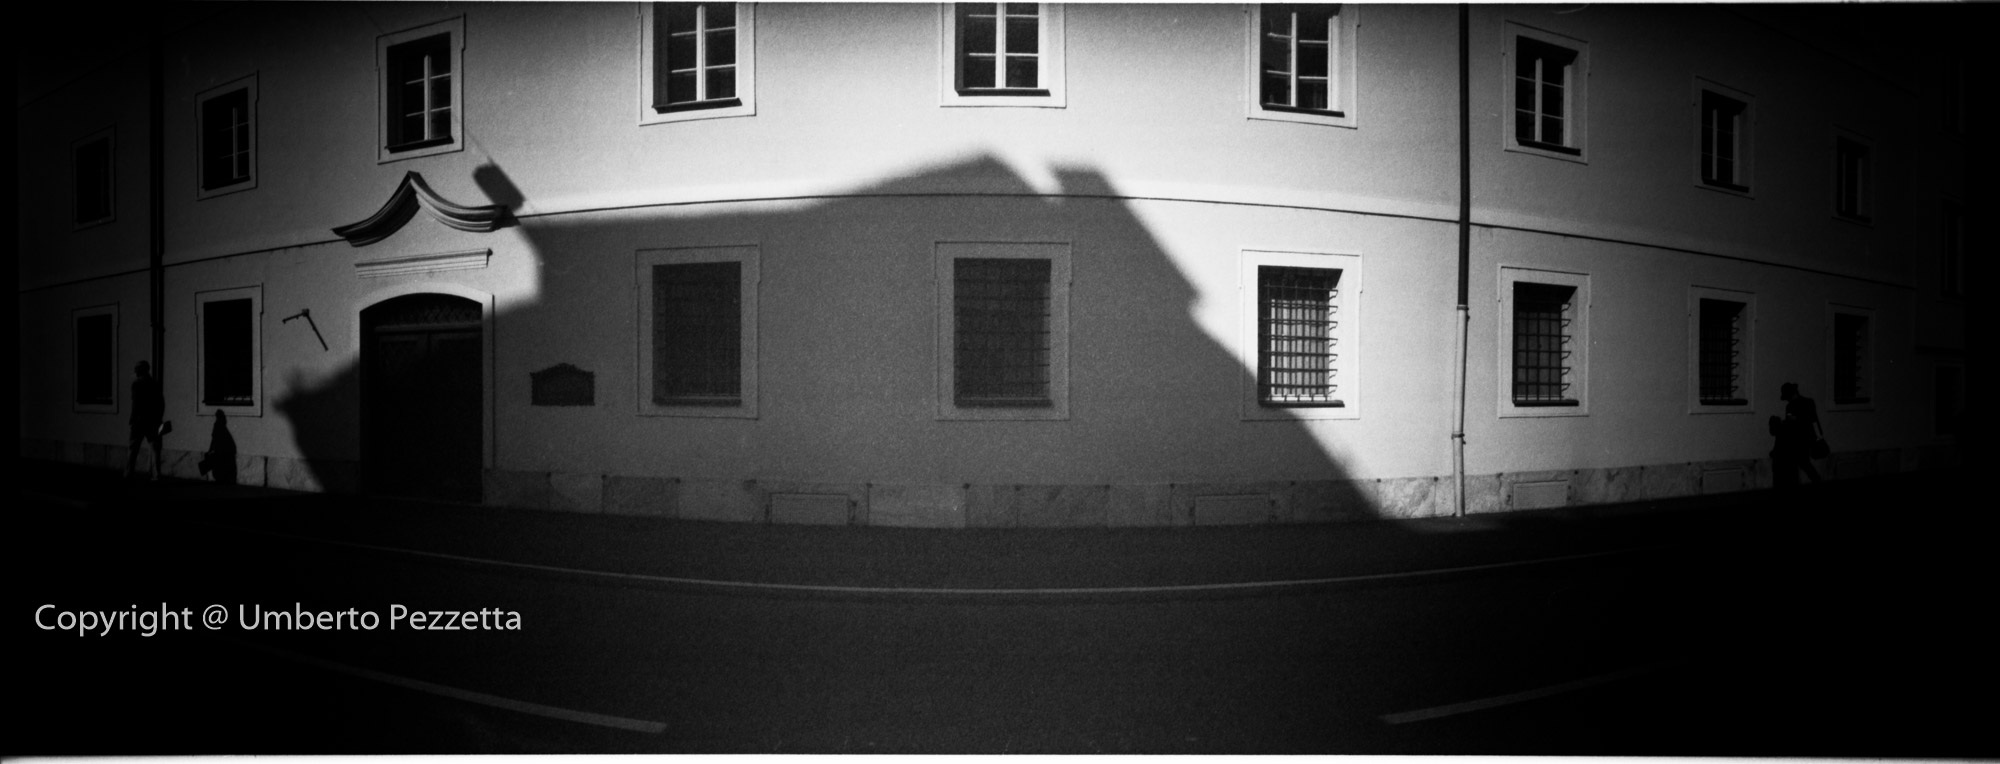 Klagenfurt - Austria (2)